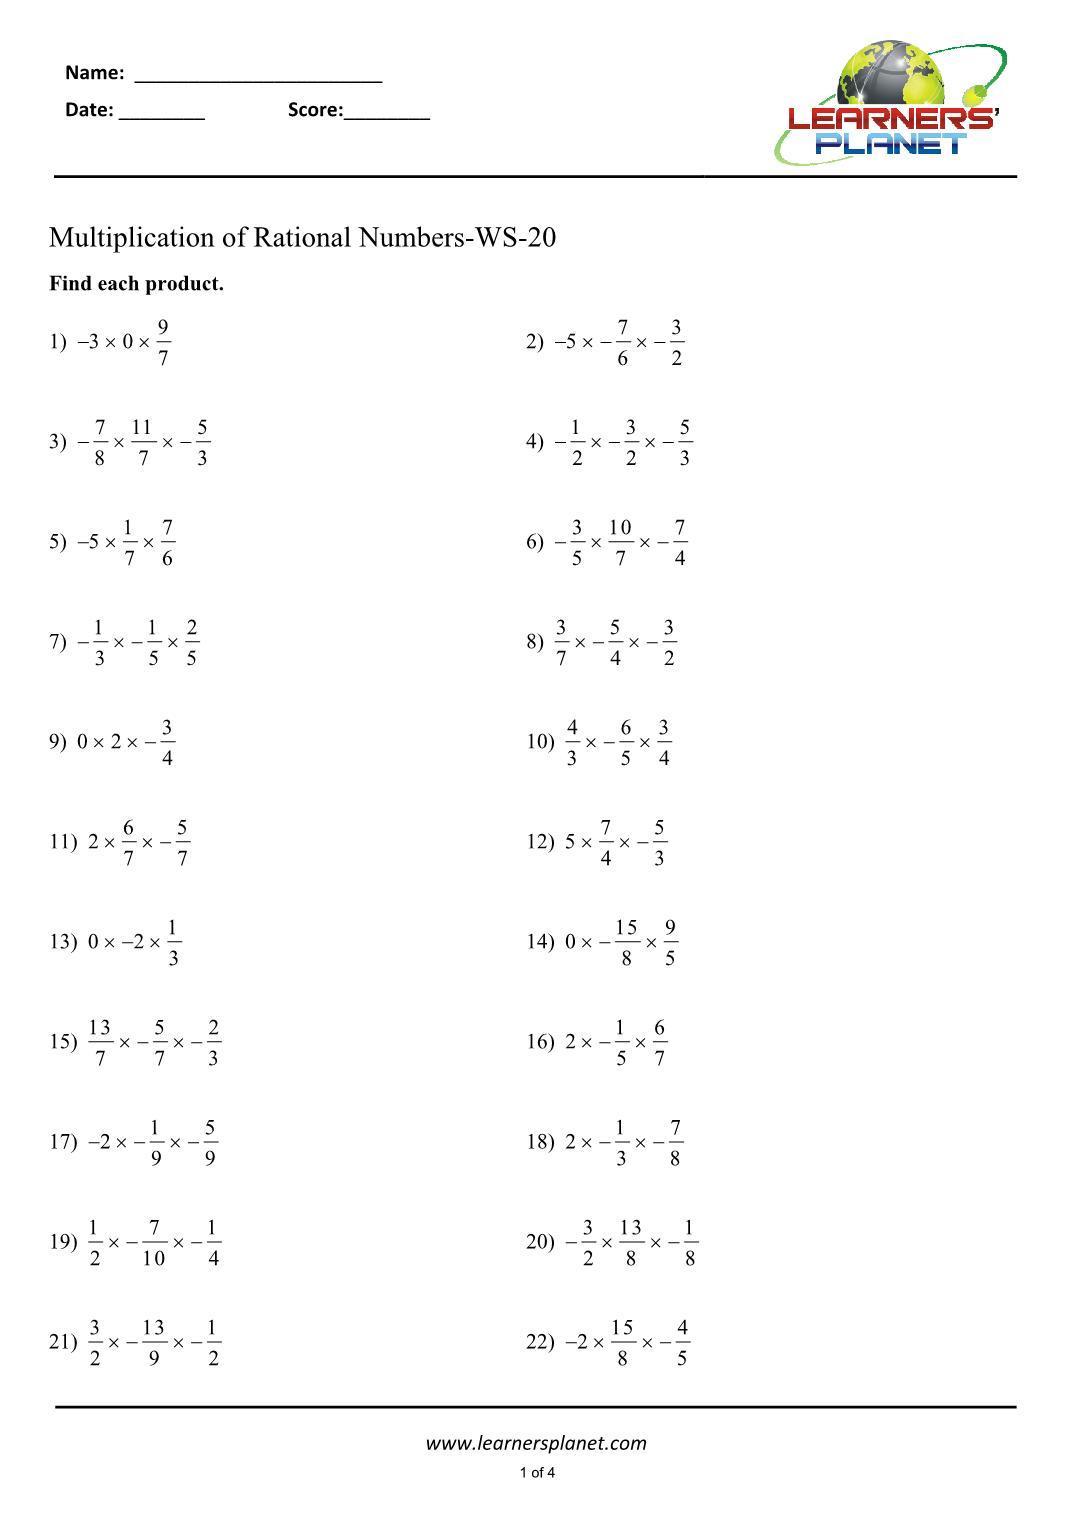 Multiplying rational numbers worksheets maths grade 5